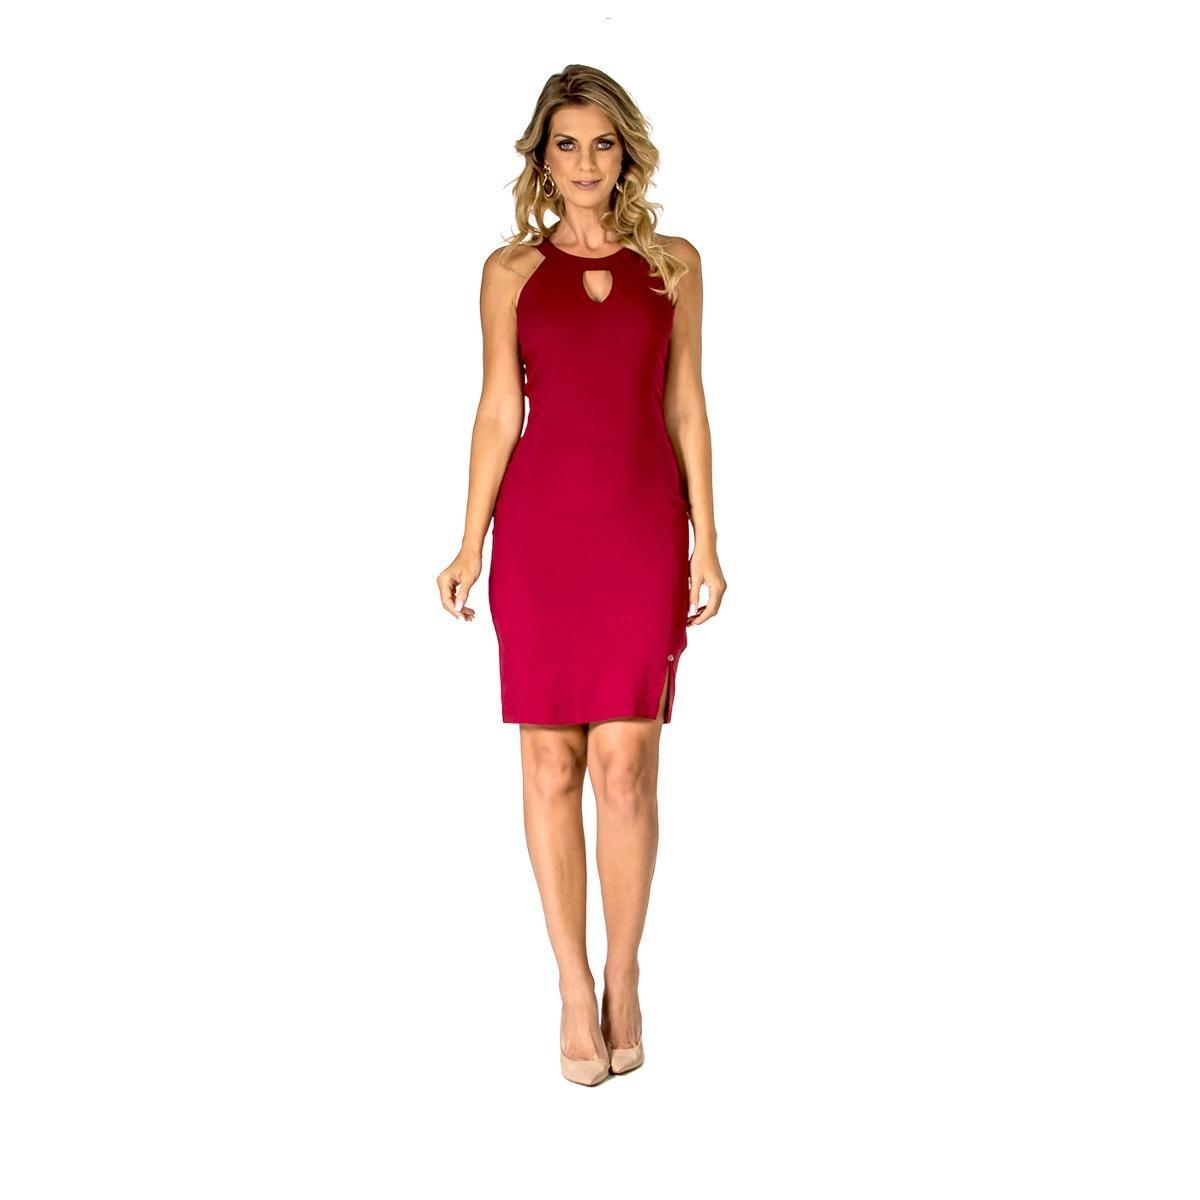 Vestido Realist Slim - Bordô gHFMXd2N